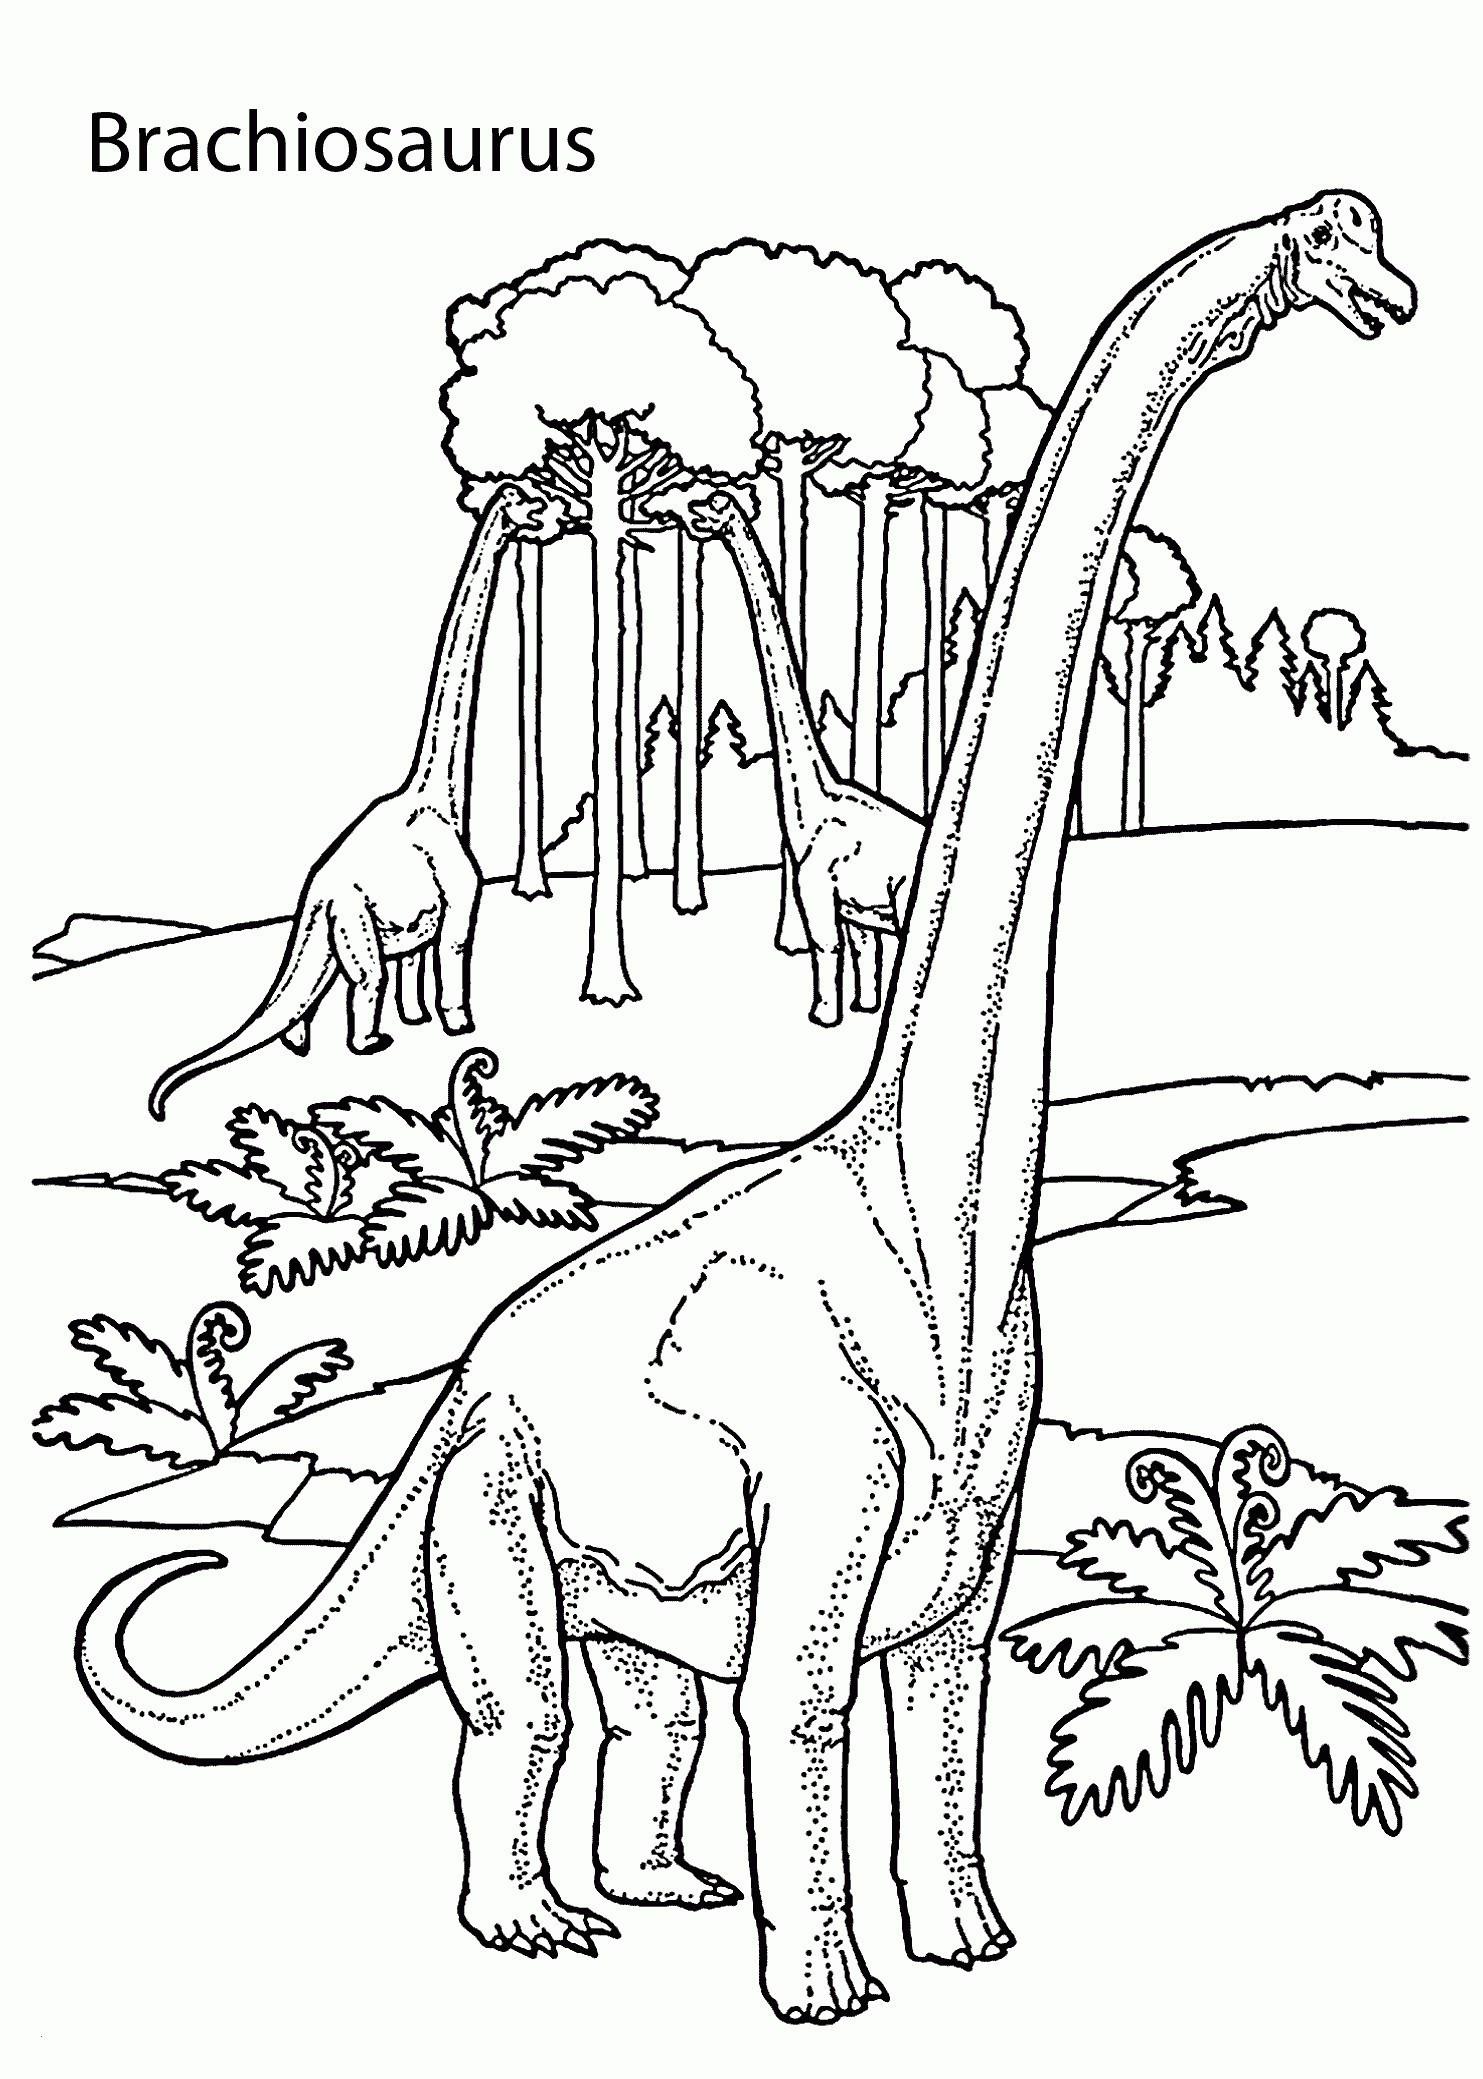 Jurassic Park Ausmalbilder Neu Ausmalbilder Jurassic World Schön Spinosaurus Ausmalbilder – Neu Bild